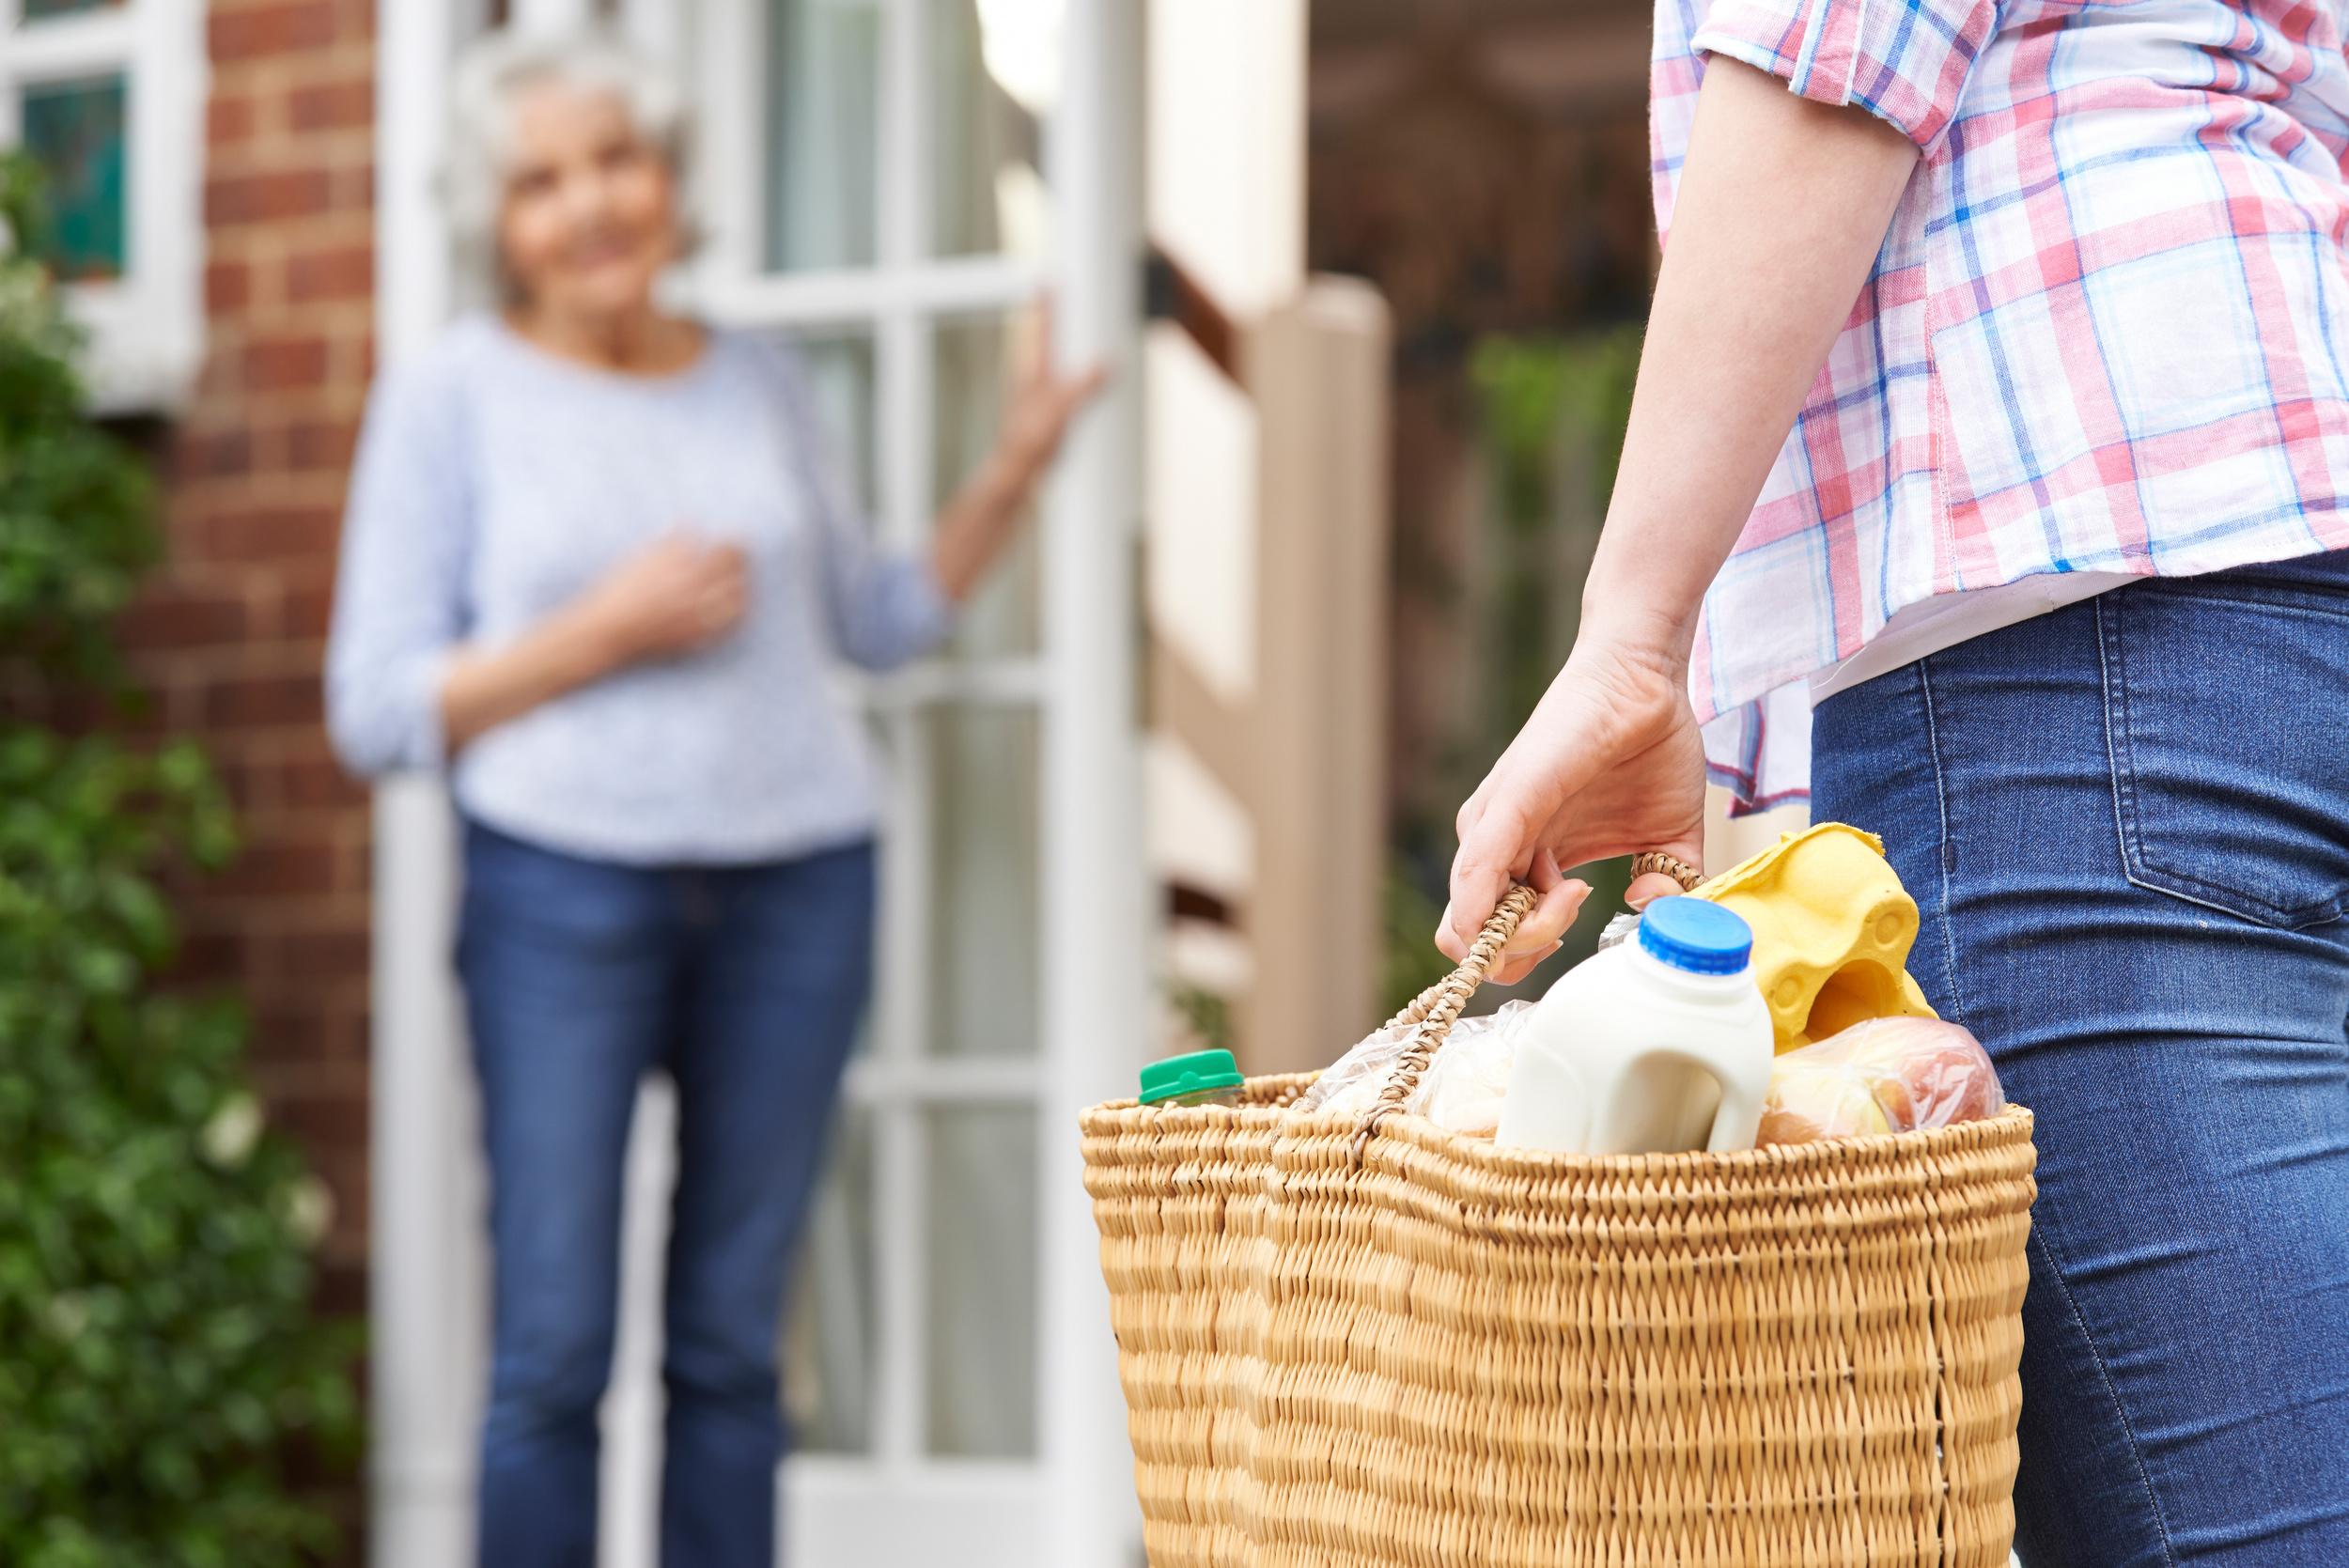 seniors luxury living, upsizing your home, downsizing your home, seniors page